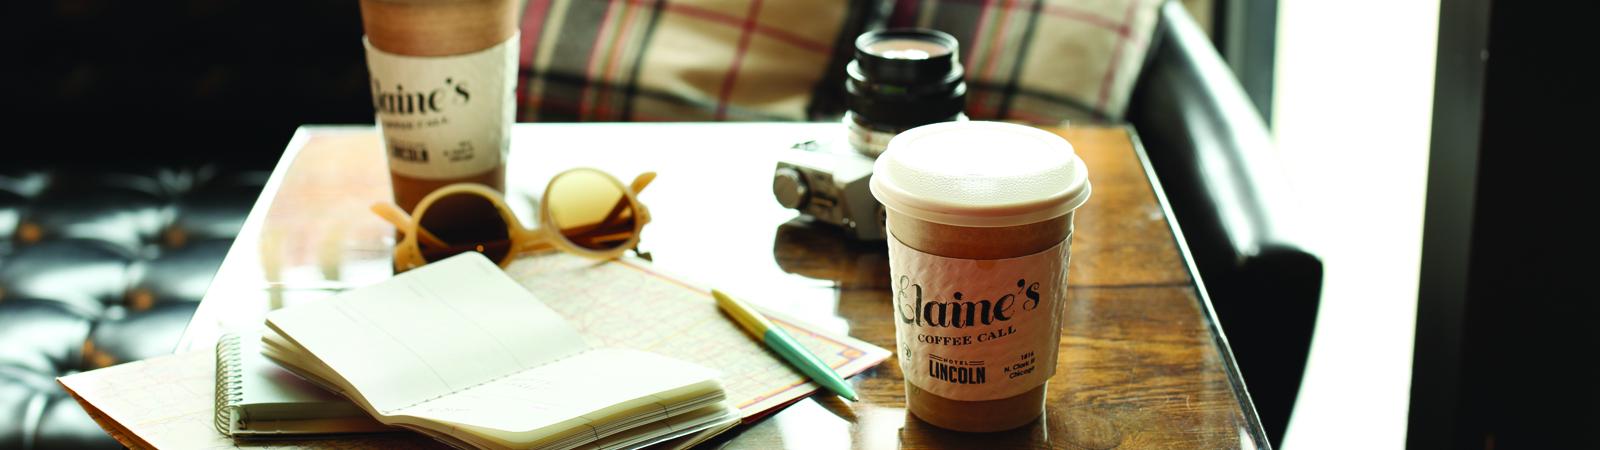 Lincoln Elaine Interior 02 KI1113